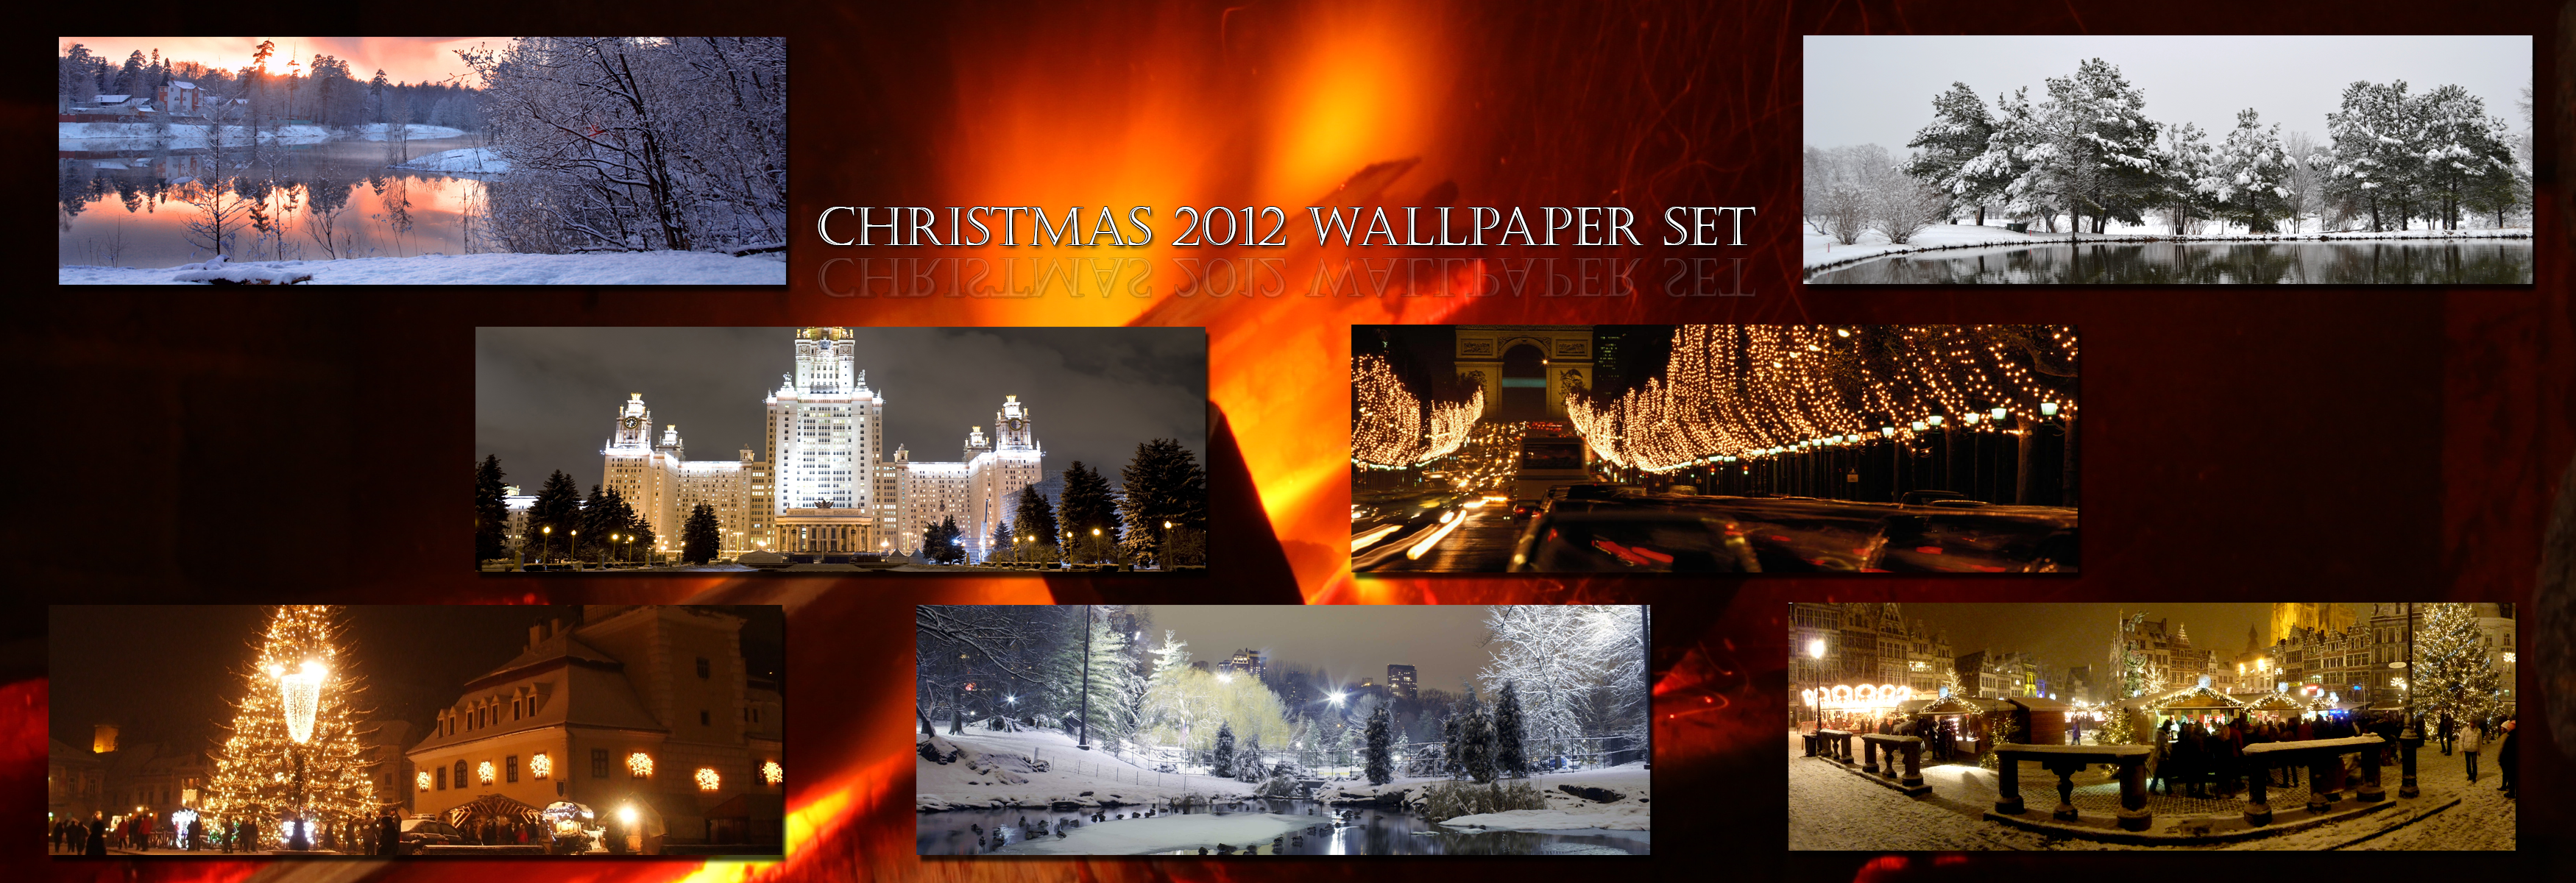 Christmas Wallpaper Set